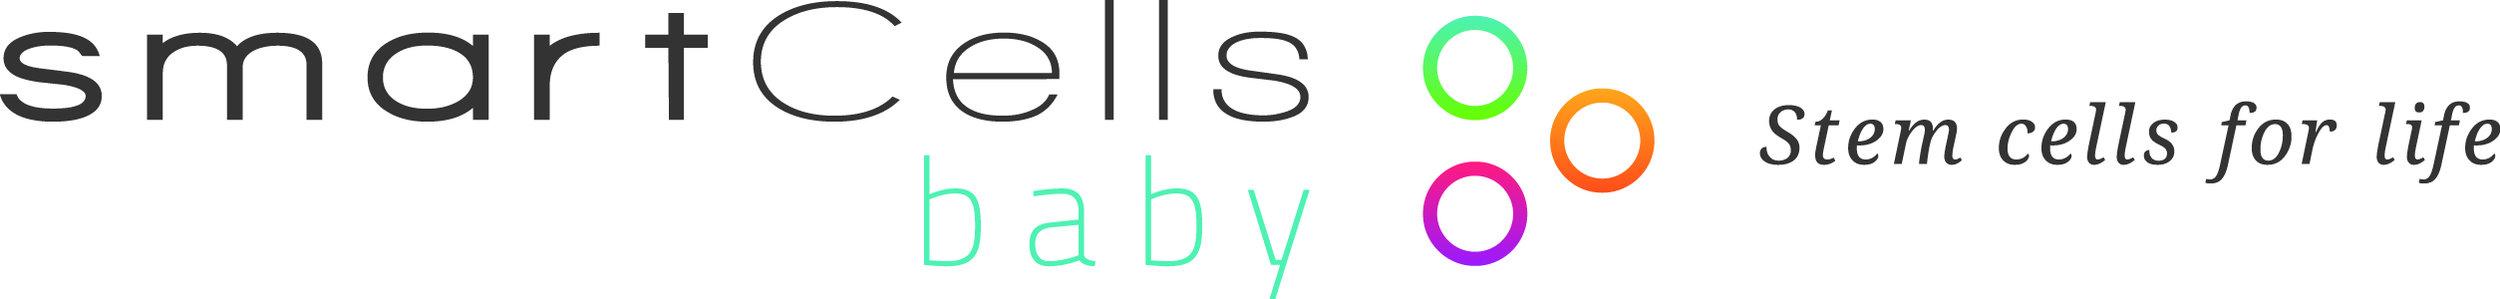 SmartCells Baby Strapline horizontal full colour.jpg